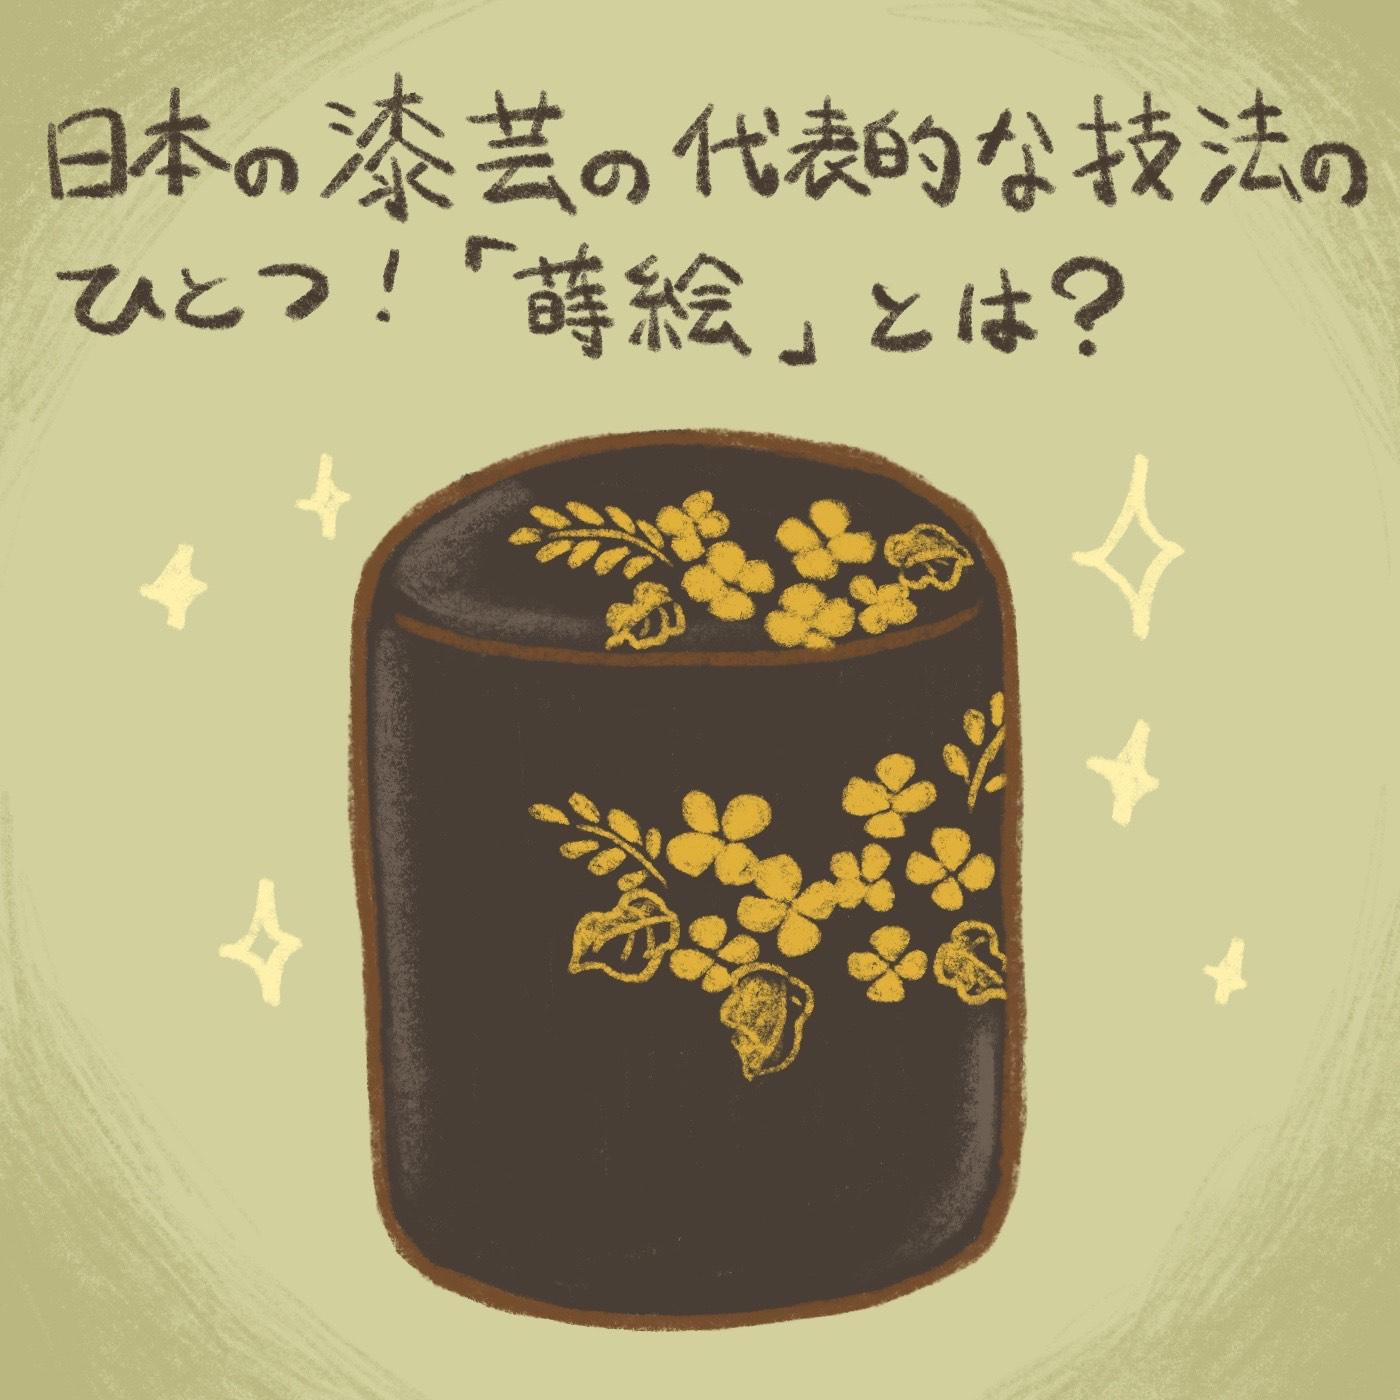 OBIKAKE ナニソレ 蒔絵 日本工芸 つちやさや